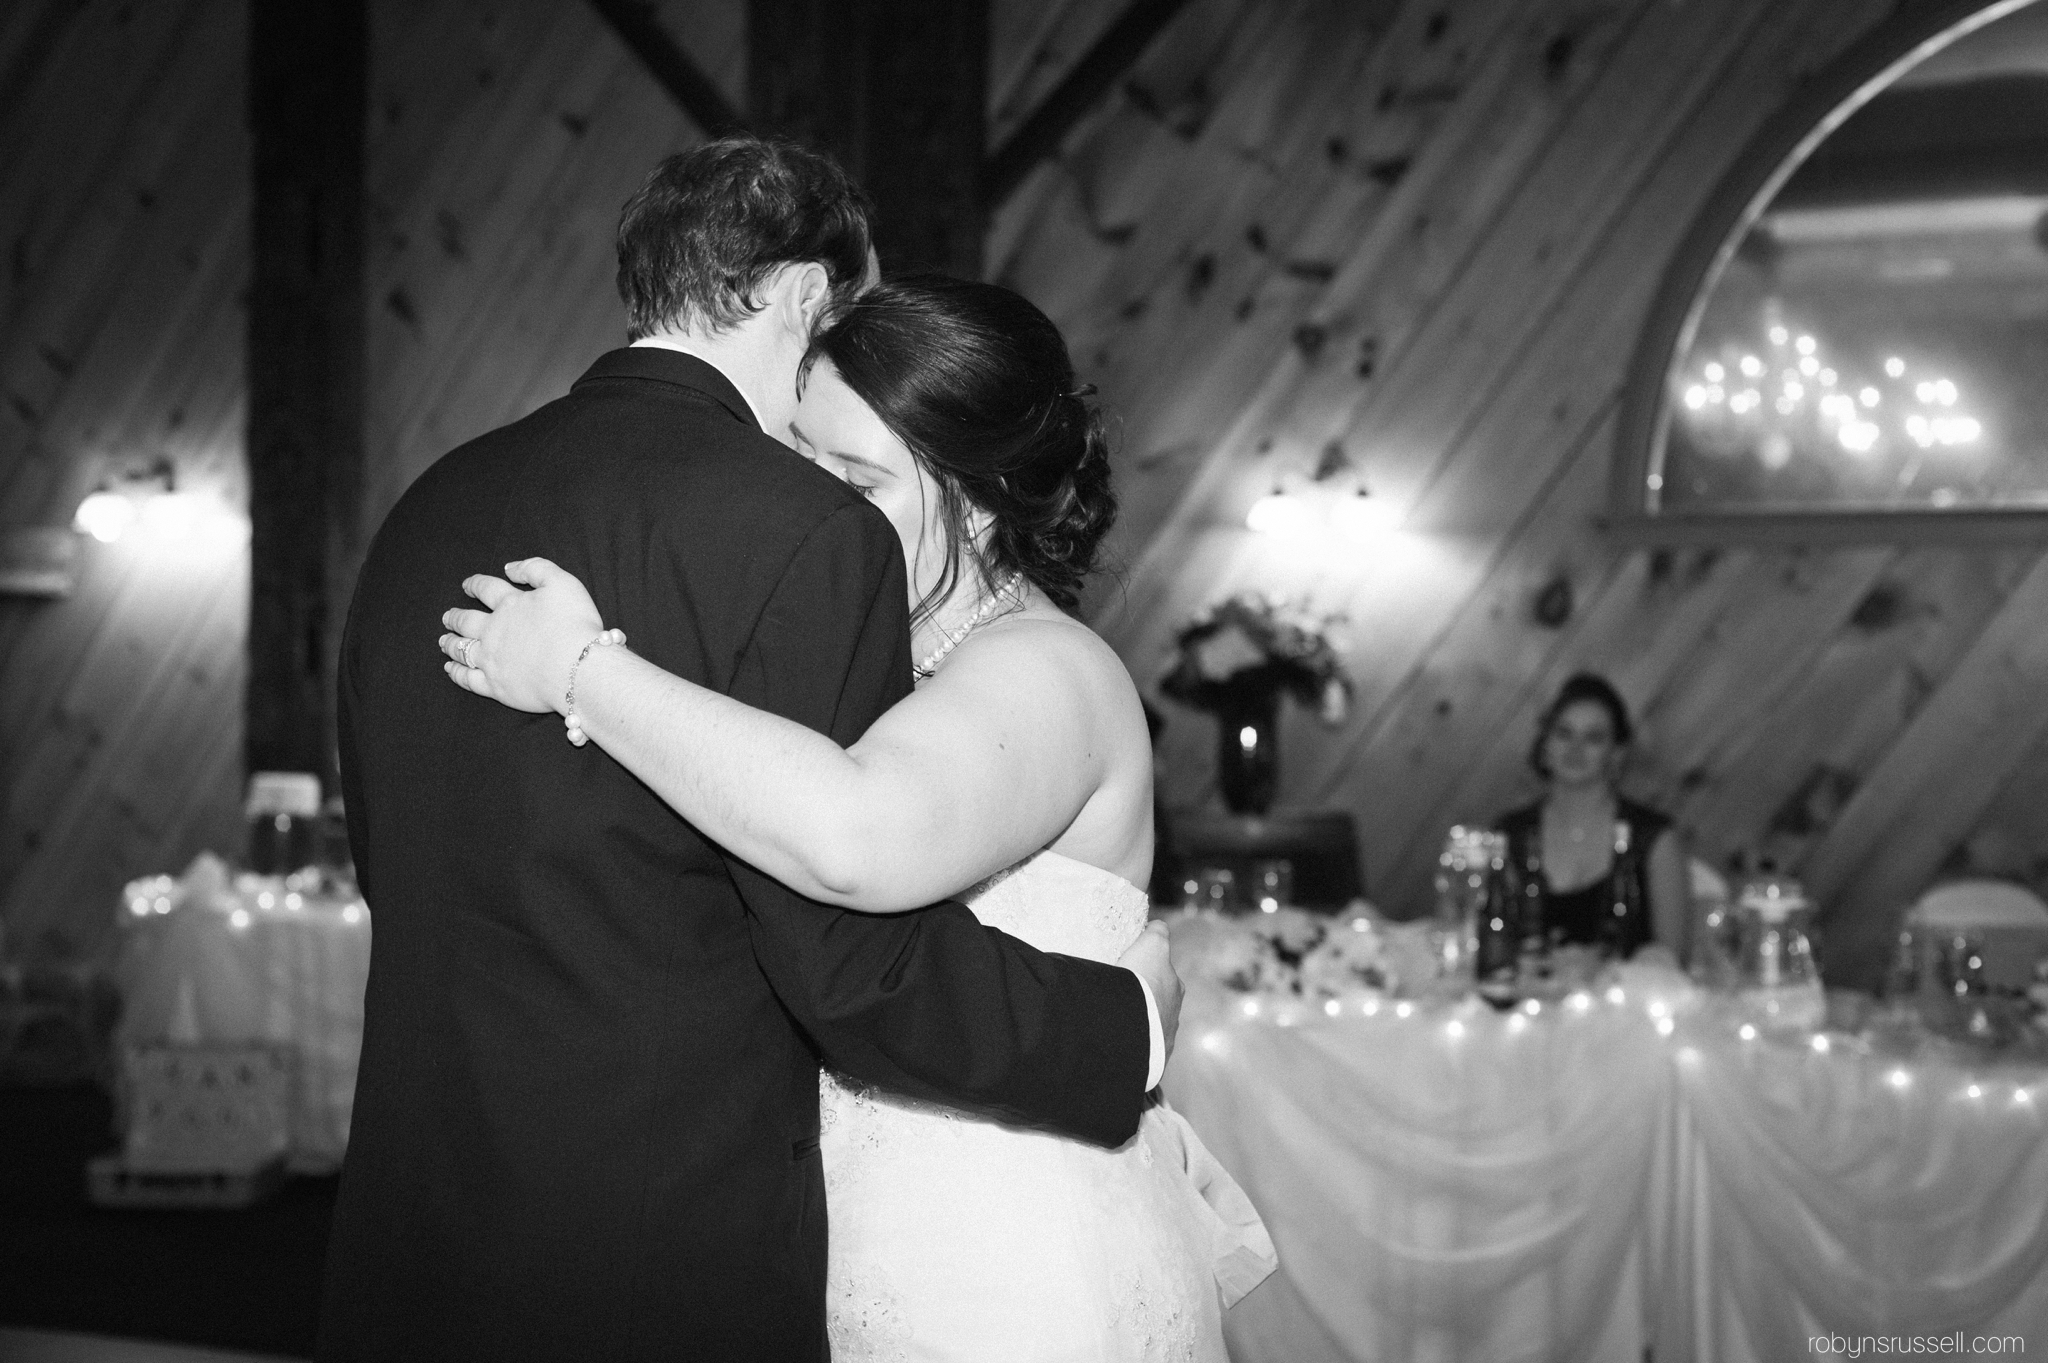 50-bride-and-groom-first-dance.jpg